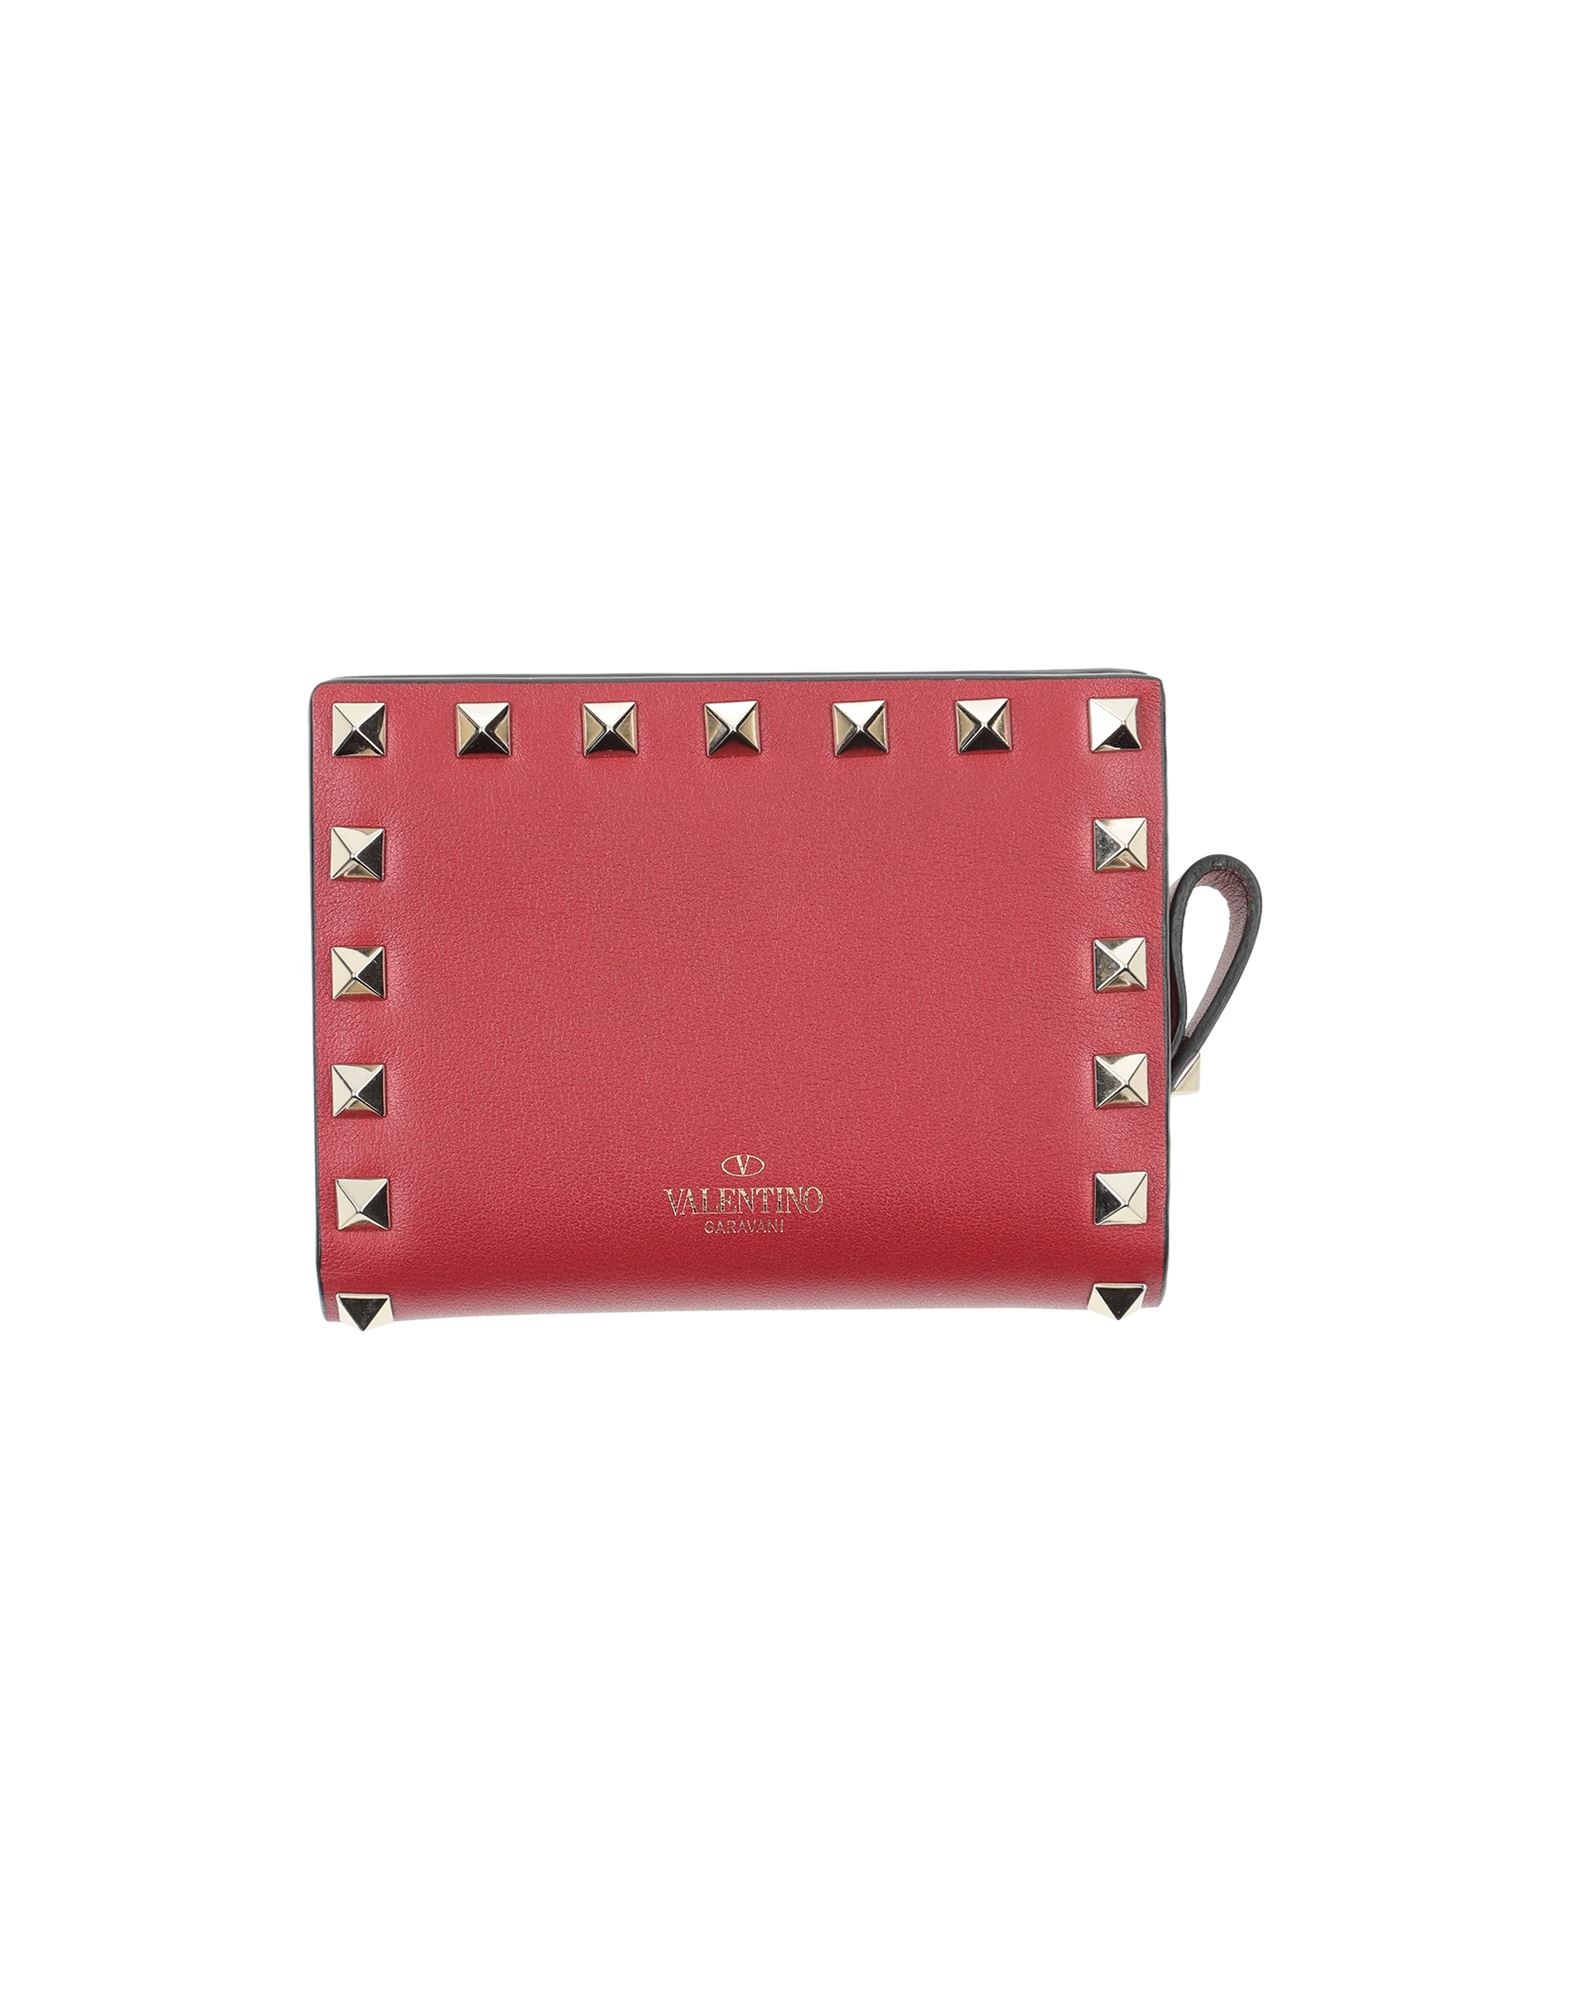 Фото - VALENTINO GARAVANI Бумажник valentino garavani аксессуары для сумок